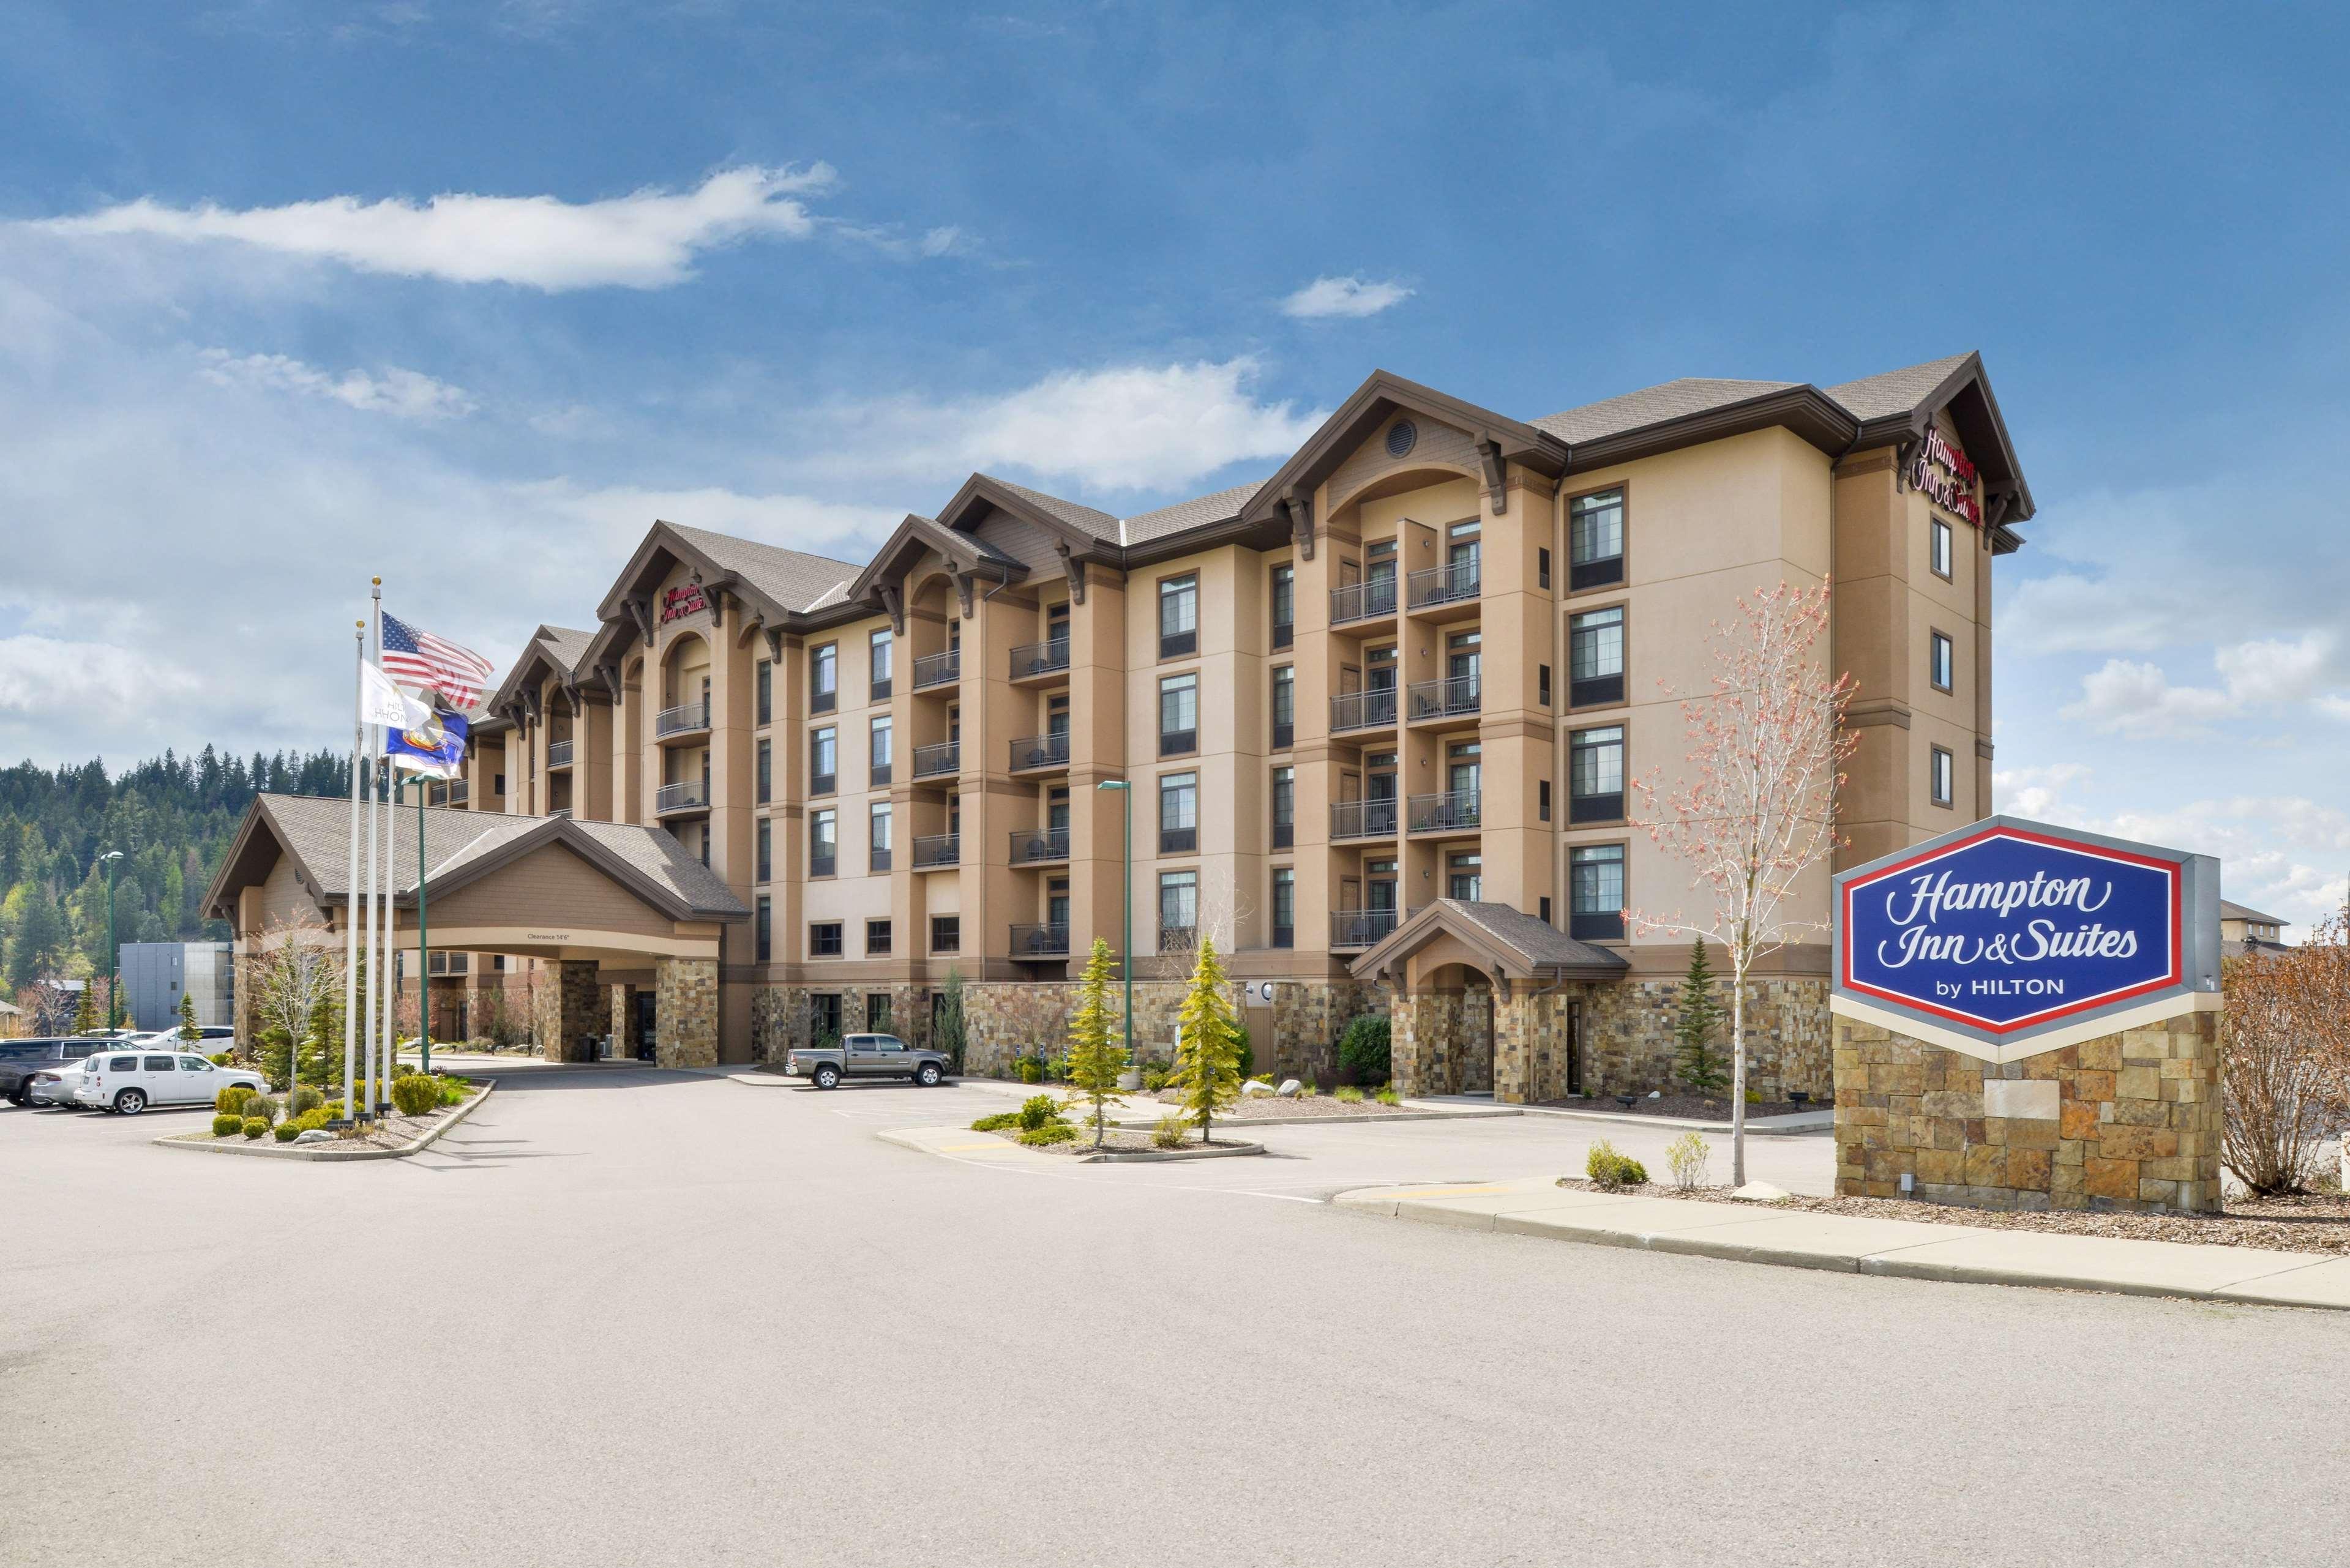 Hampton Inn & Suites Coeur d' Alene image 0